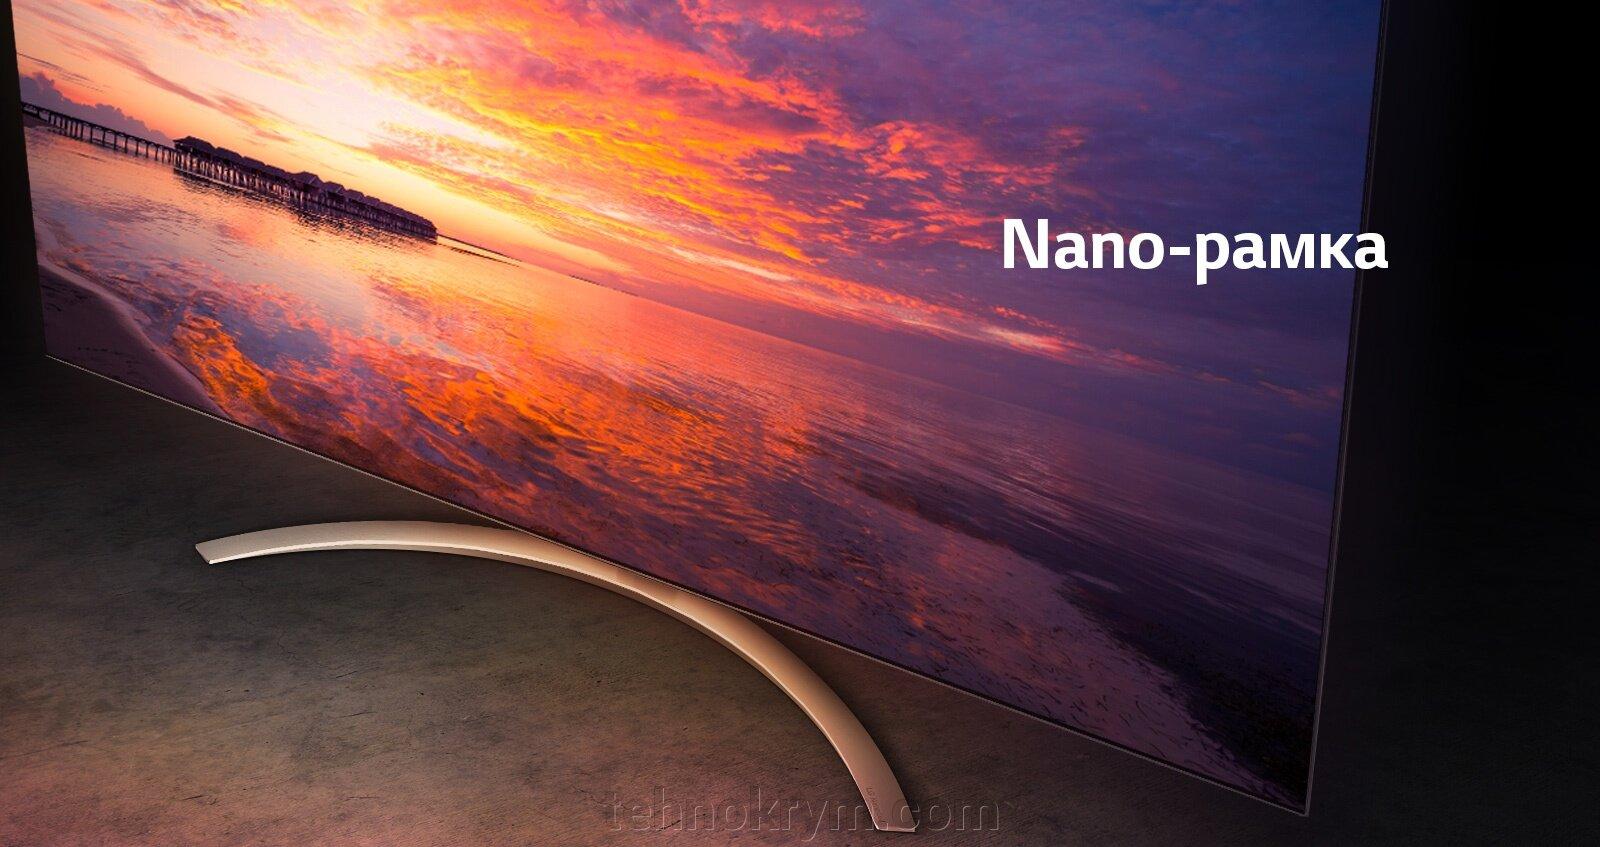 Smart телевизор LG NanoCell 49SM9000PLA, Ultra HD, черный, webOS 4.5 - фото LG NanoCell 49SM9000PLA